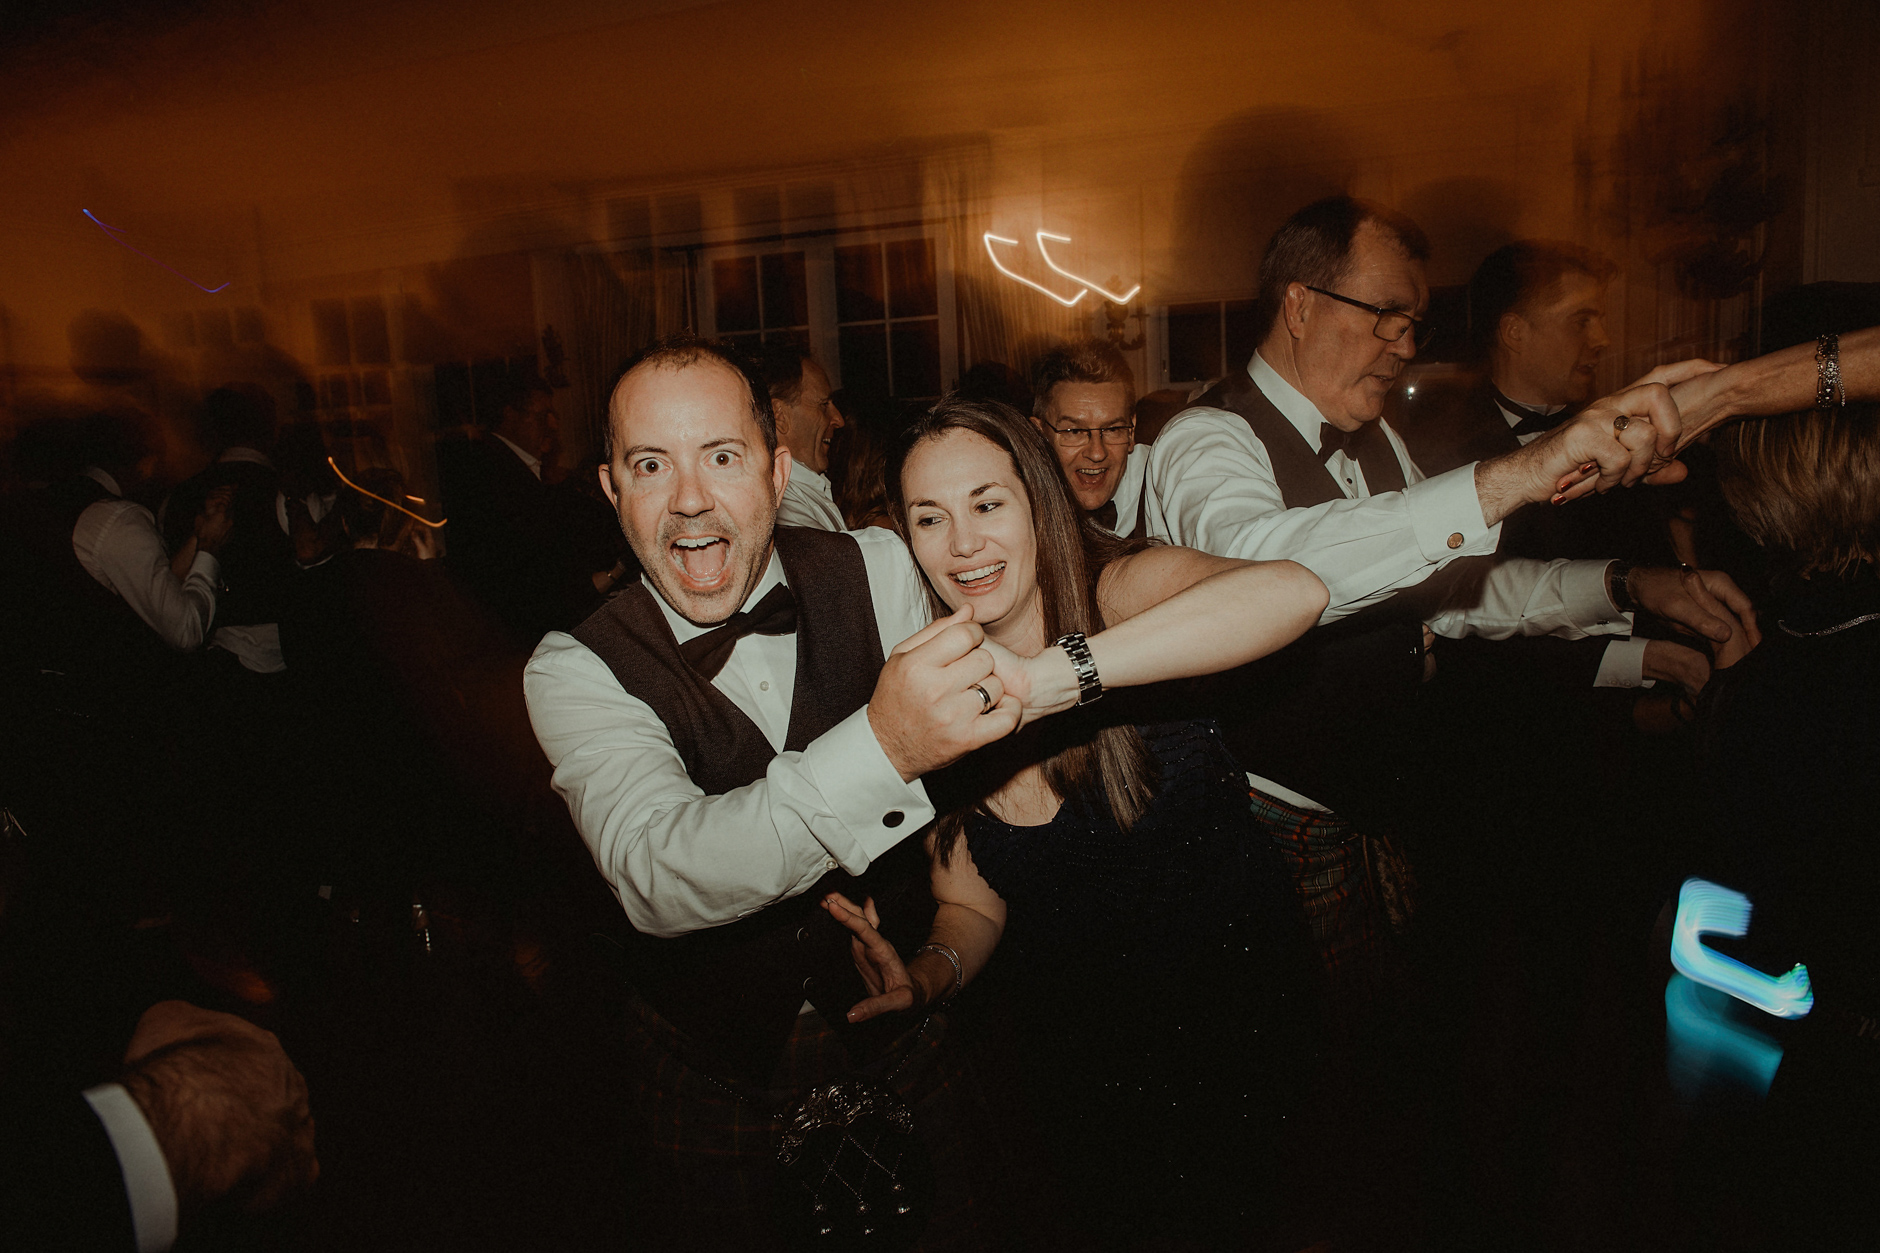 Glentruim-Wedding-Nikki-Leadbetter-Photography-396.jpg